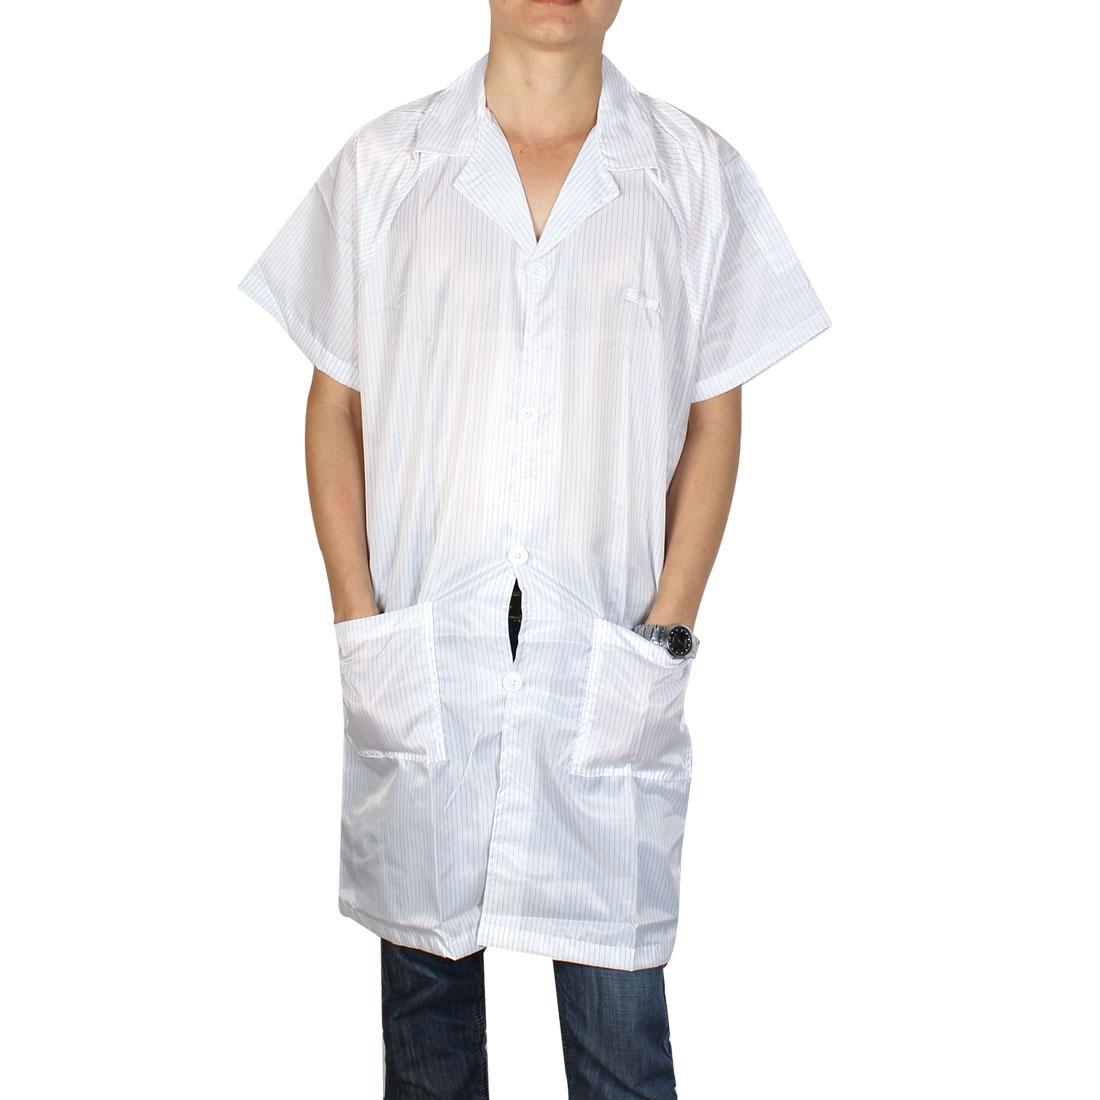 Unisex Lapel Collar Button Up ESD Lab Anti Static Overalls Coat Uniform White XL